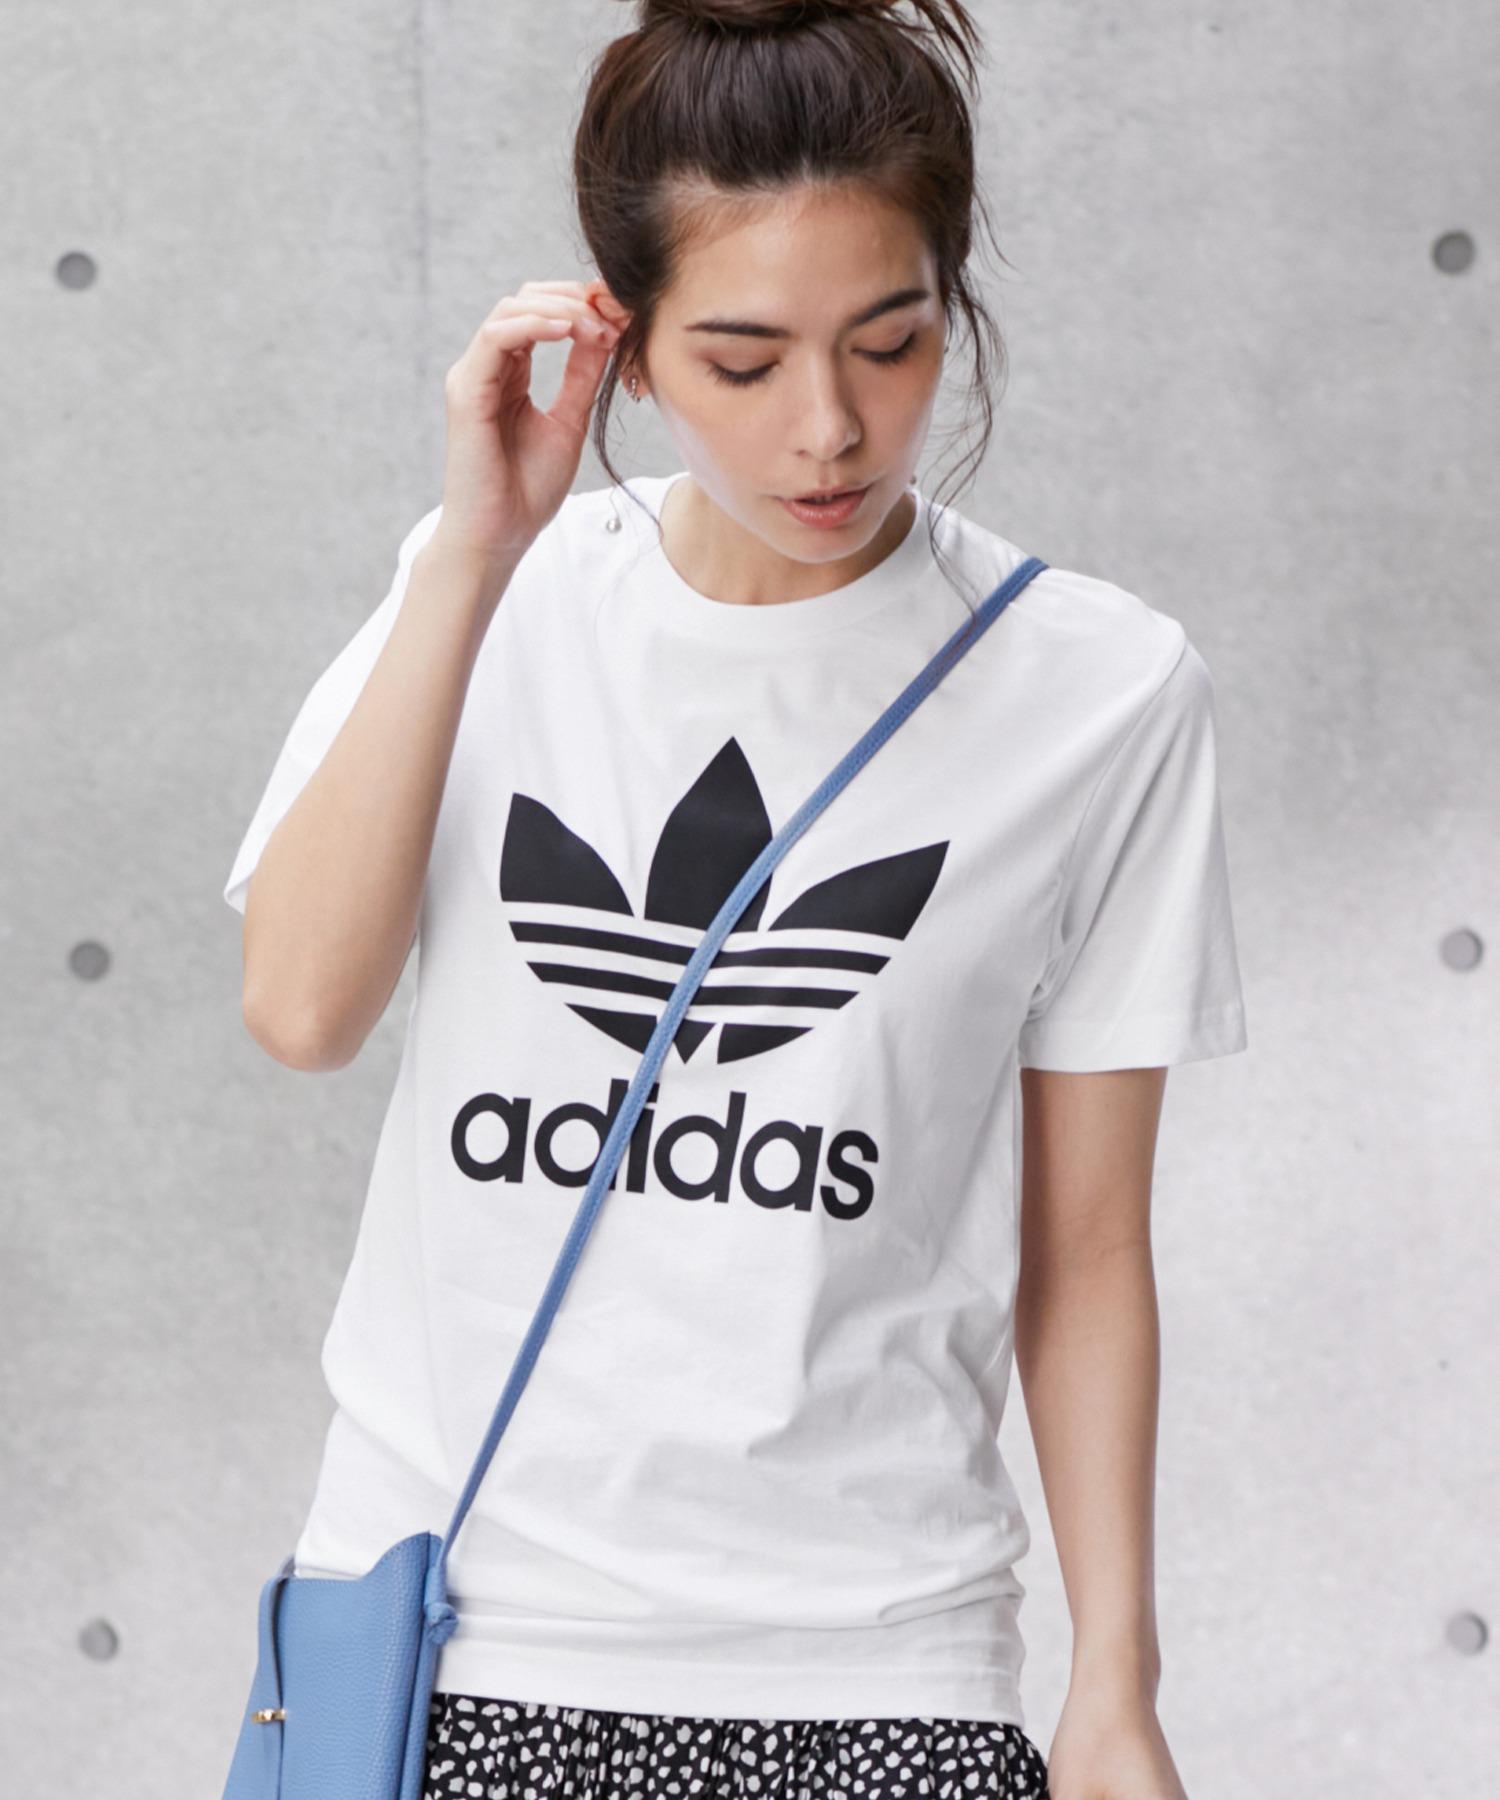 adidas/アディダス トレフォイルロゴプリント オーバーサイズ コットン 半袖 Tシャツ